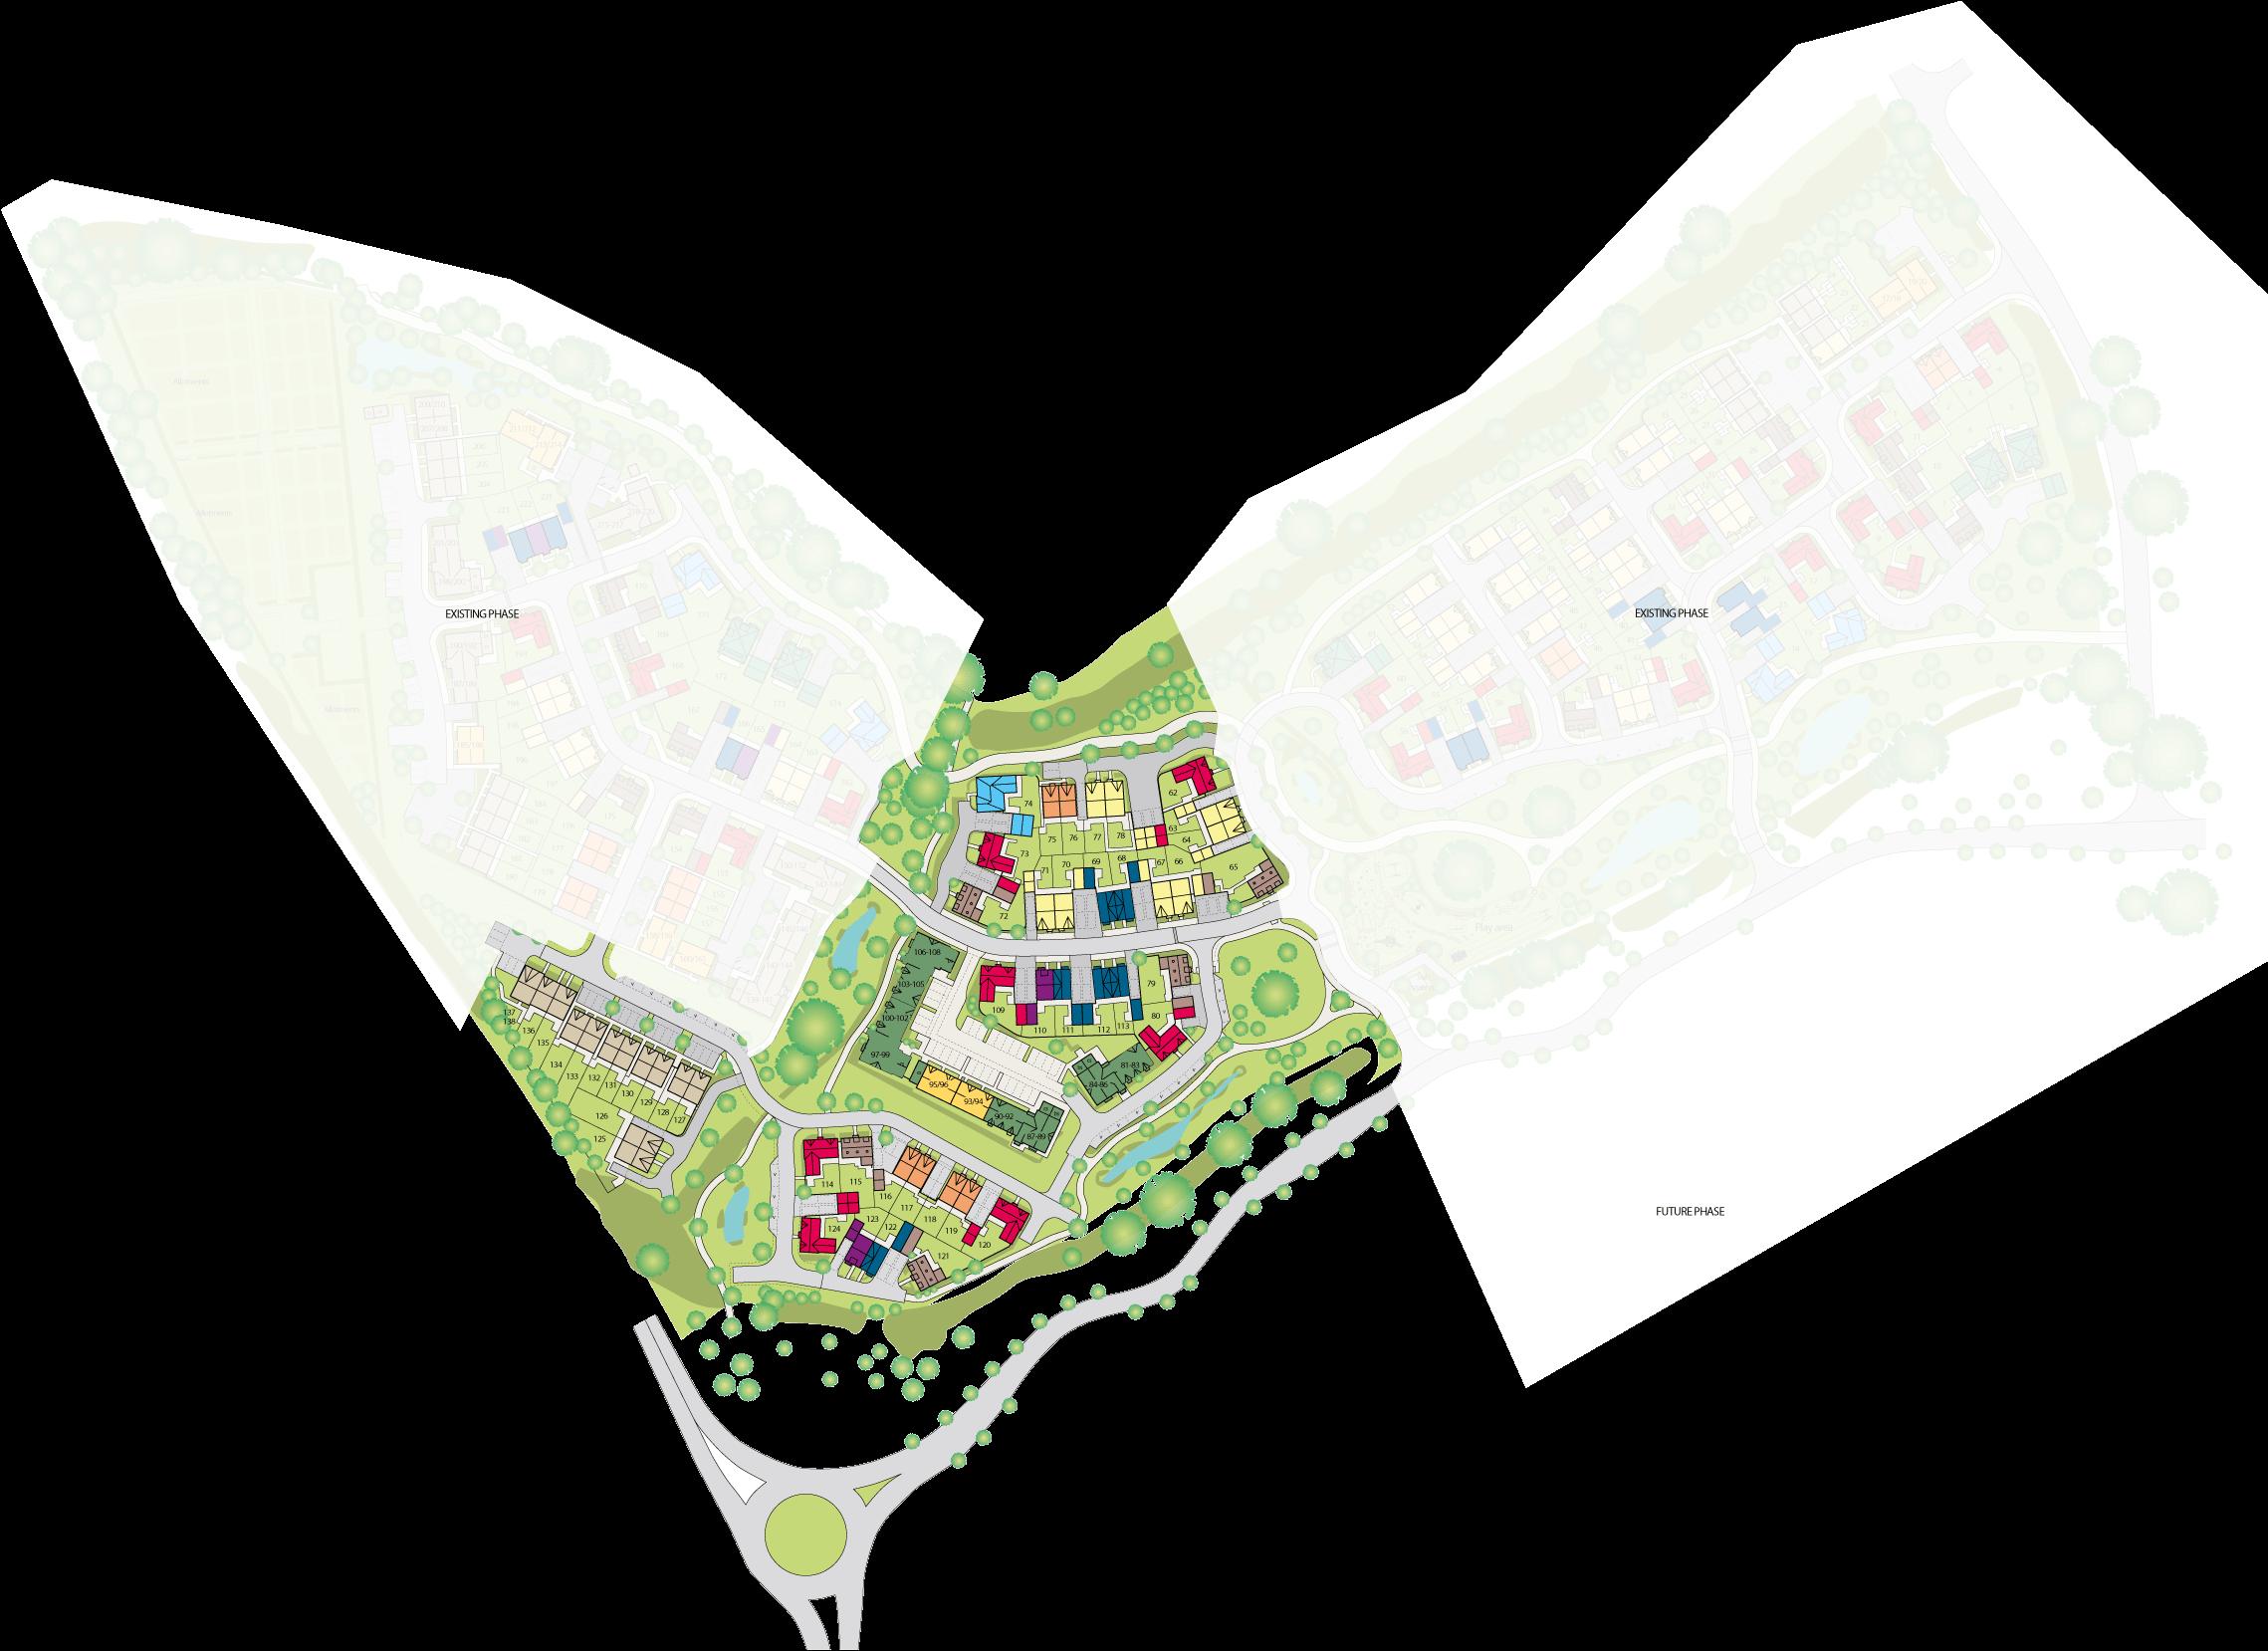 Nightingale Fields at Arborfield Green plan